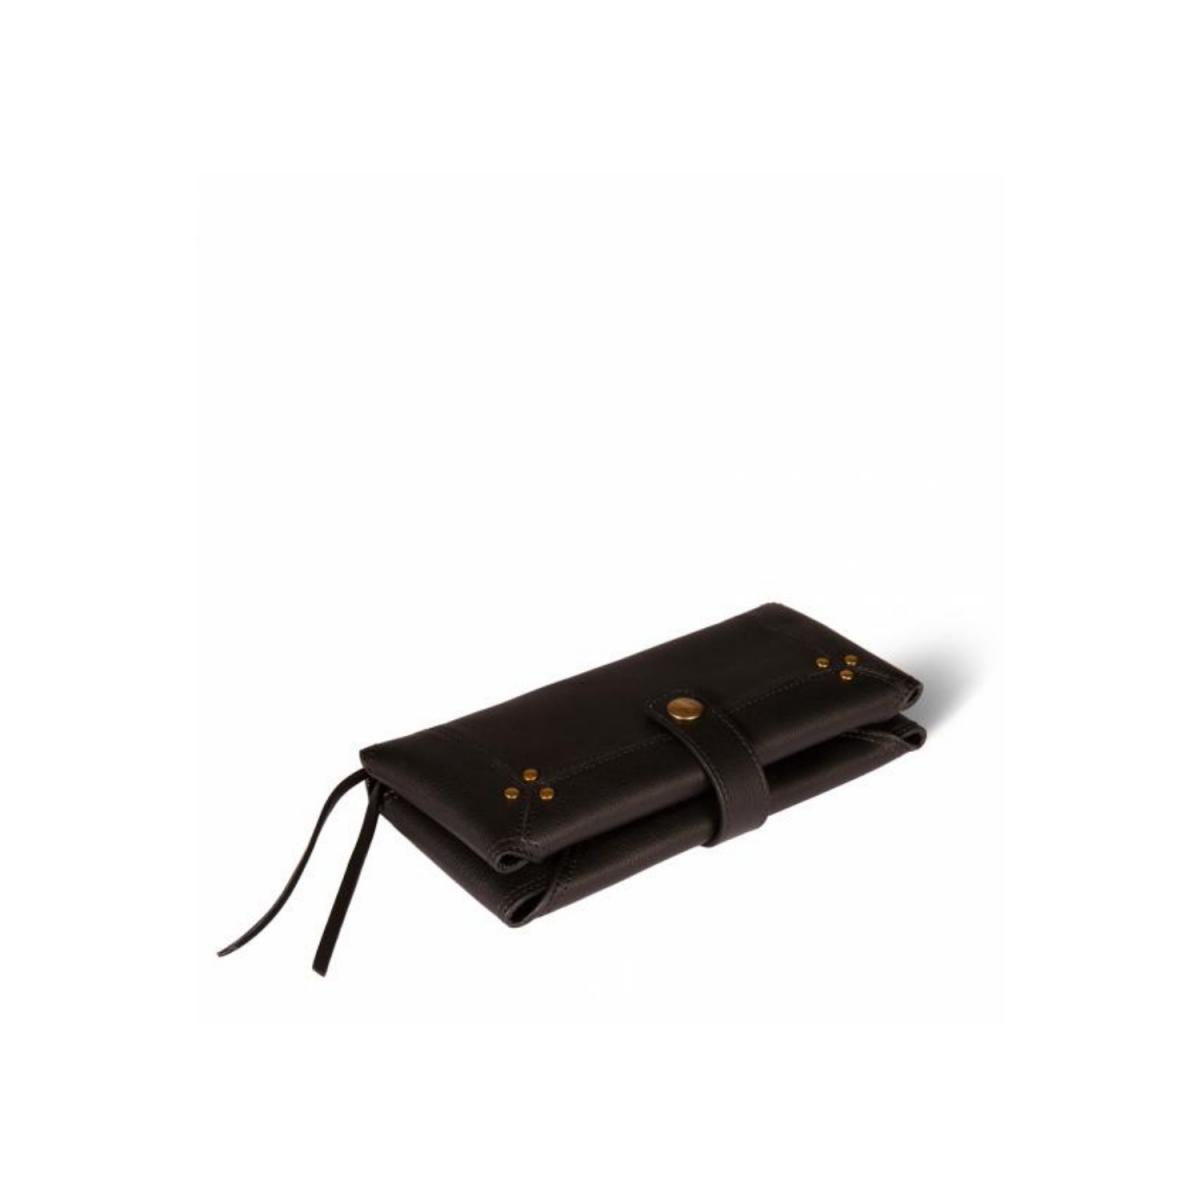 Porte mobile L - noir brass